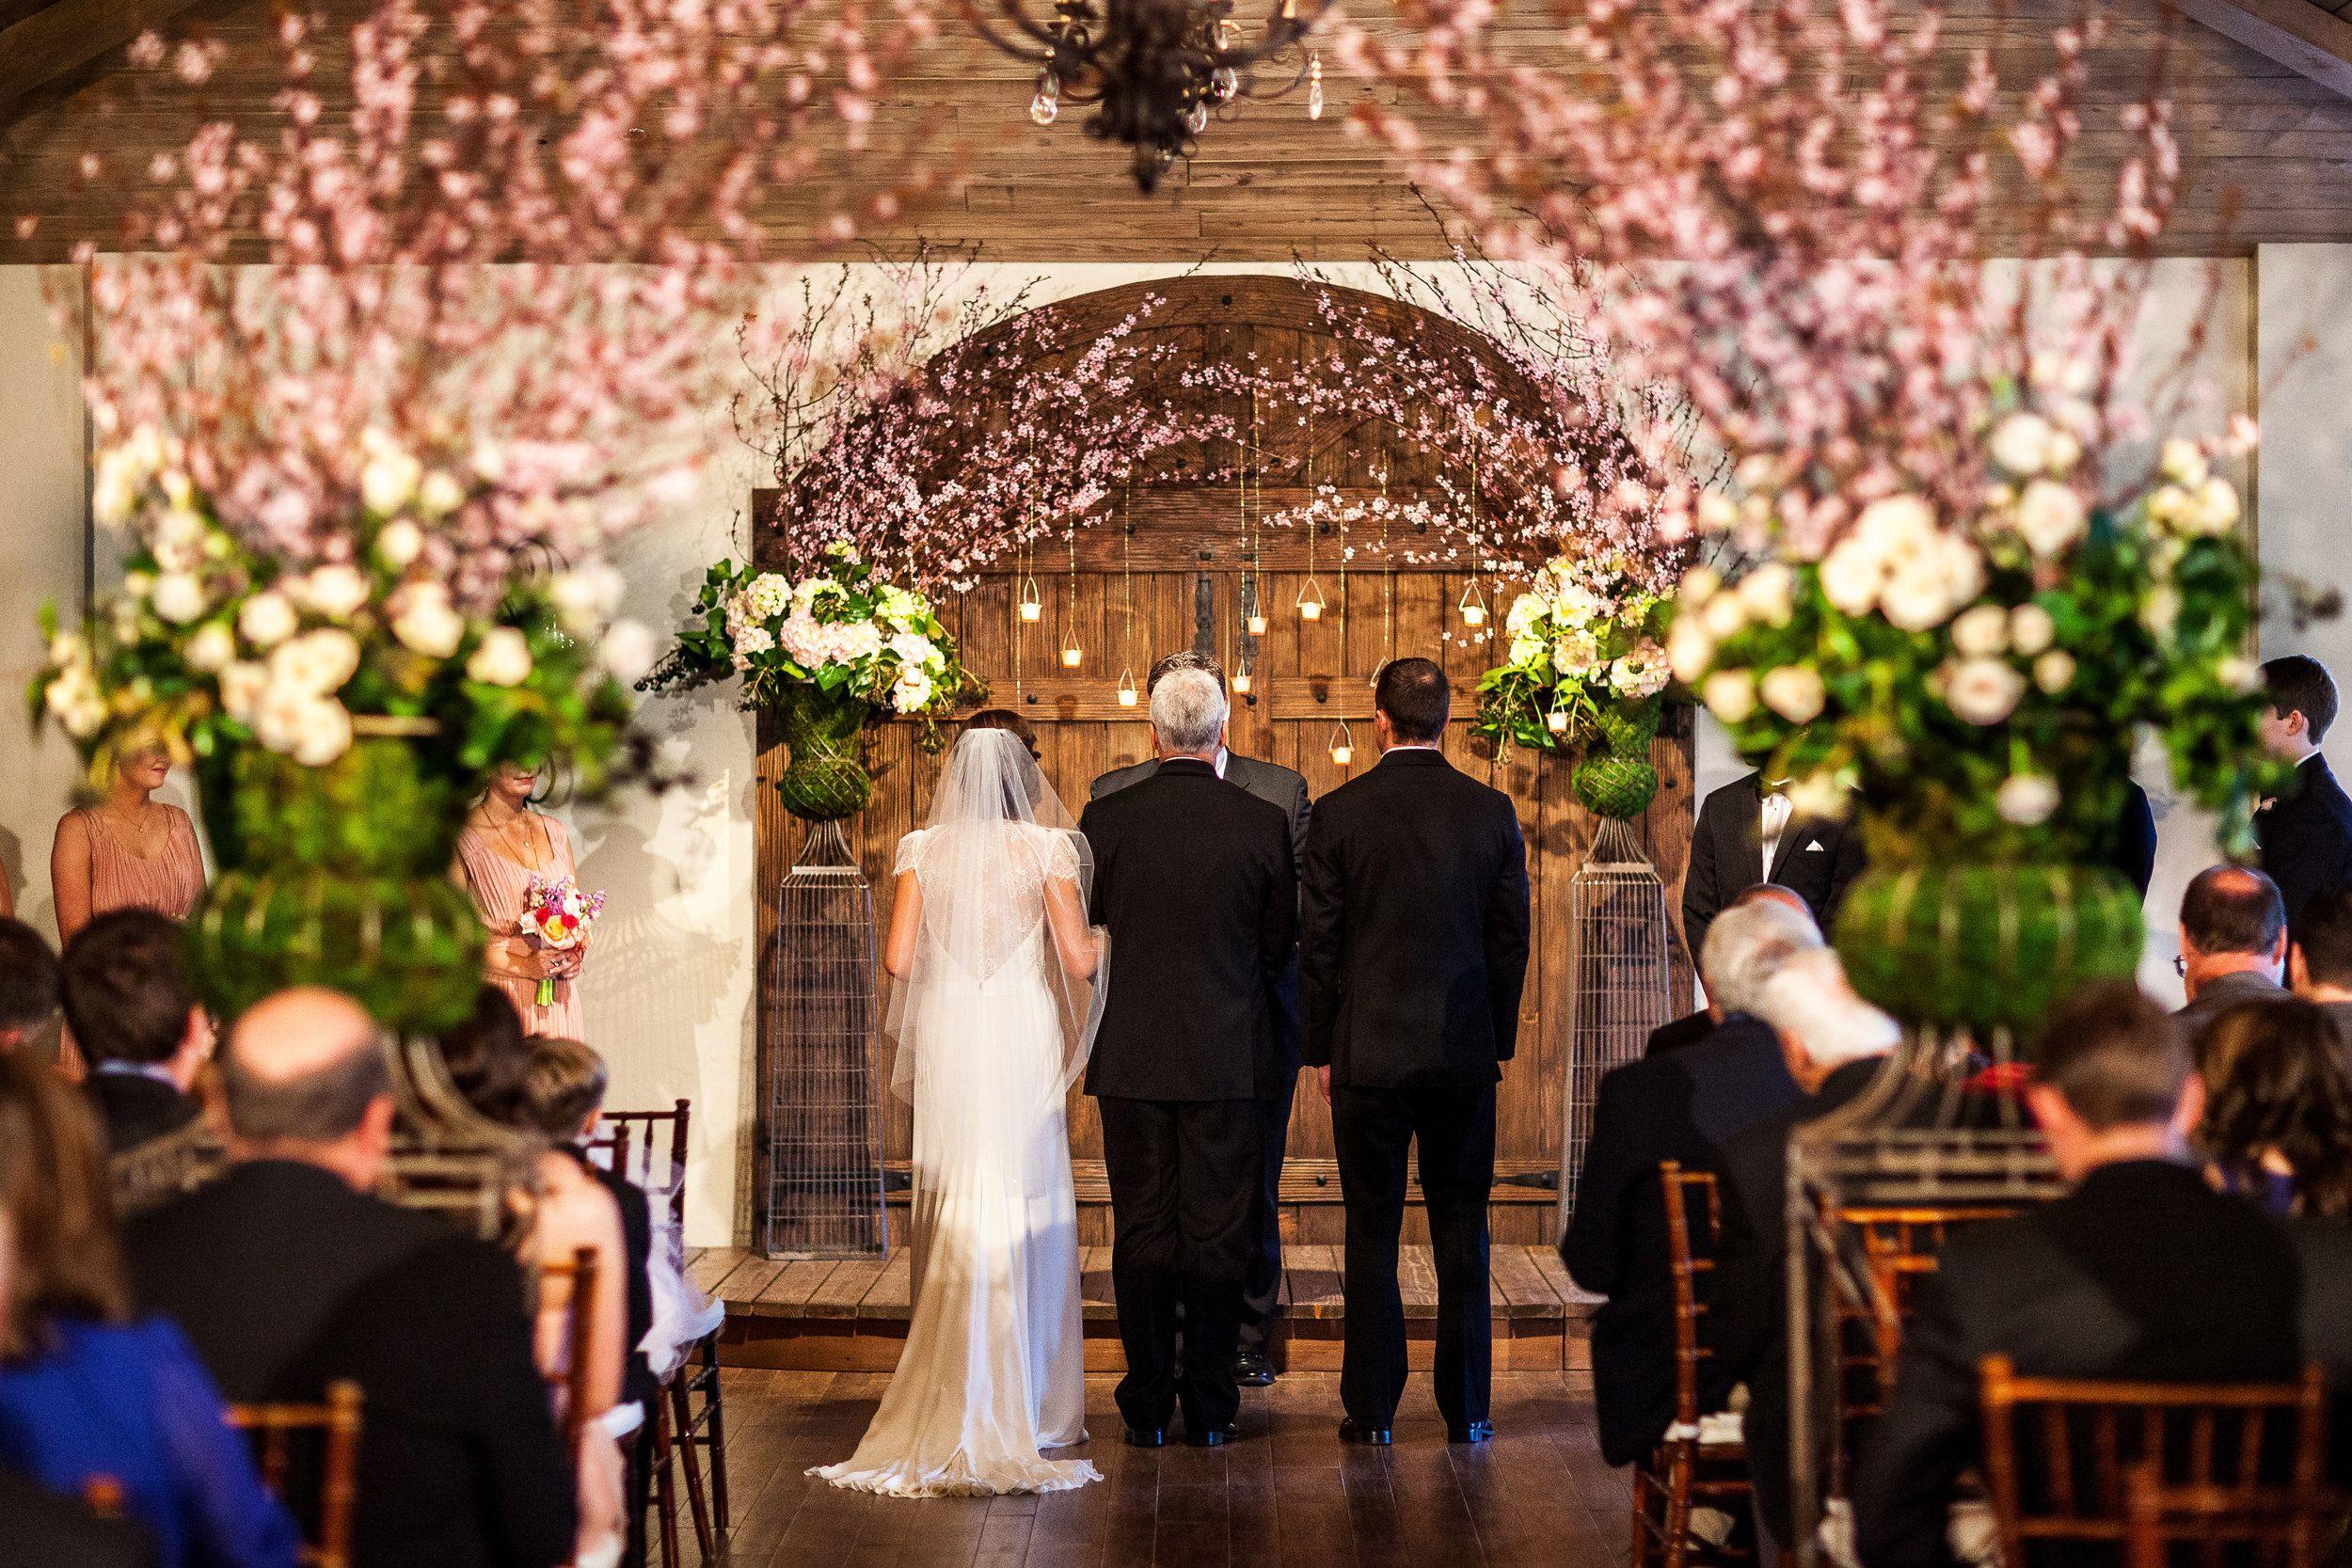 ba4f13406e79aab0dceb1b8c537f1433 - The Gardens Wedding Chapel Oklahoma City